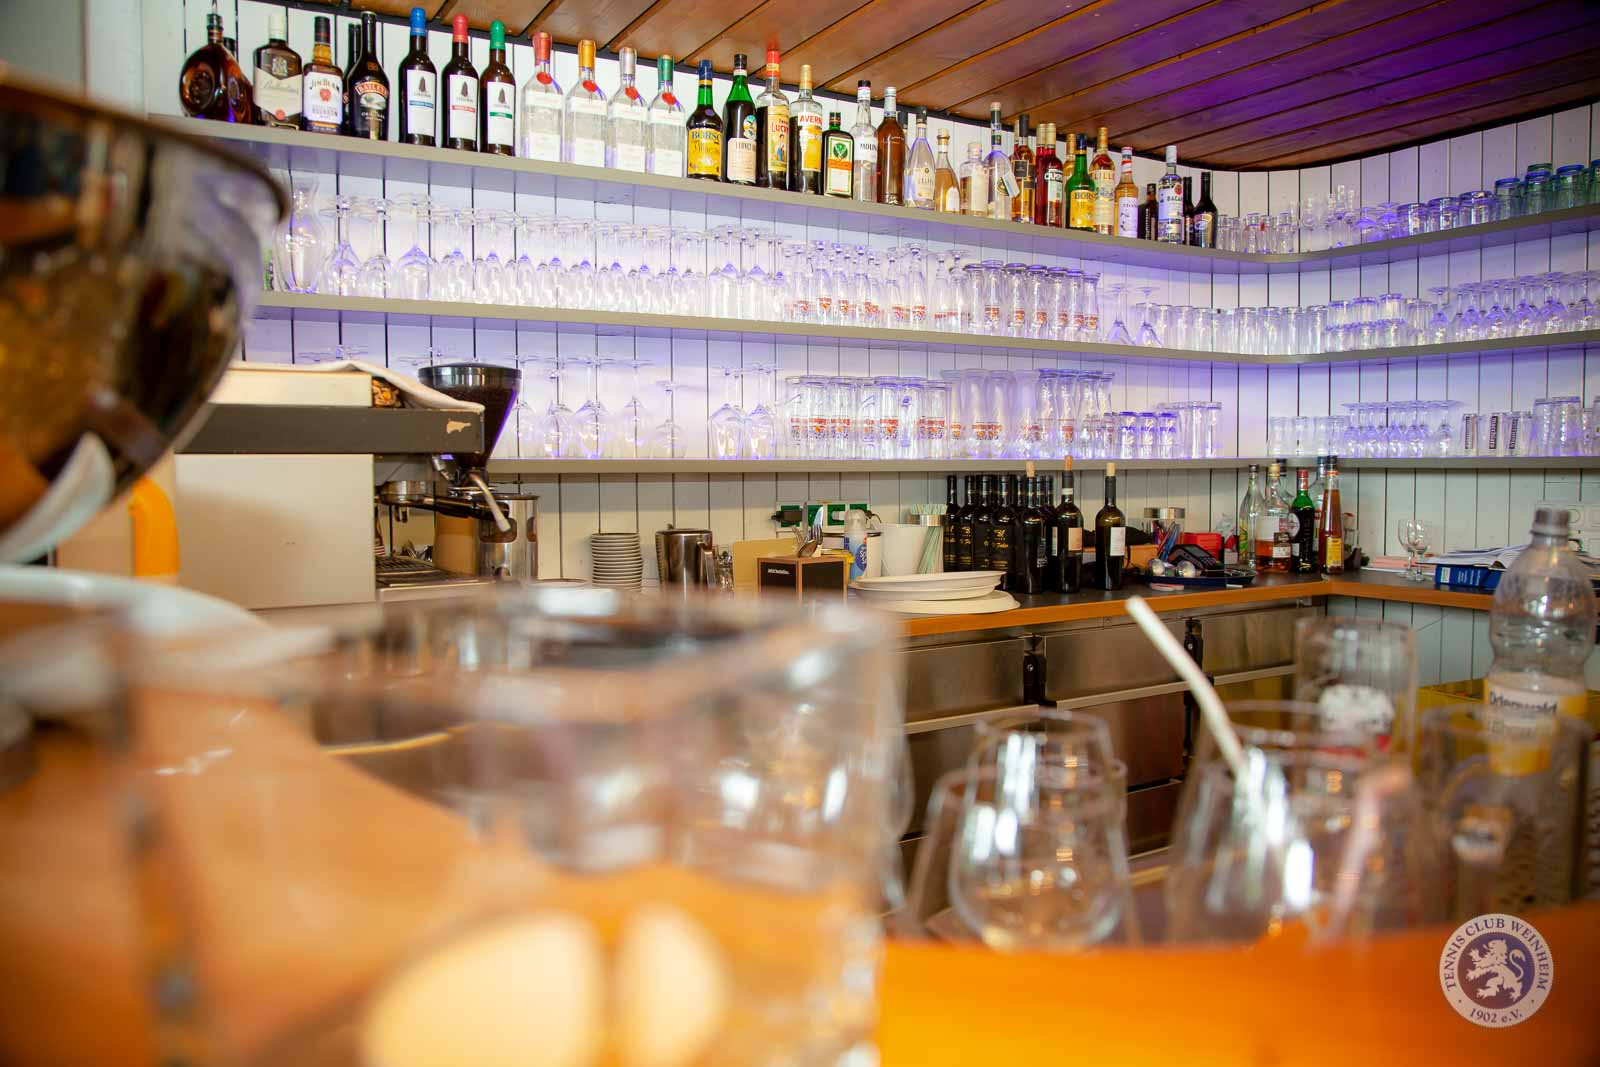 Restaurant Giardino Bar; Ristorante Giardino Bar